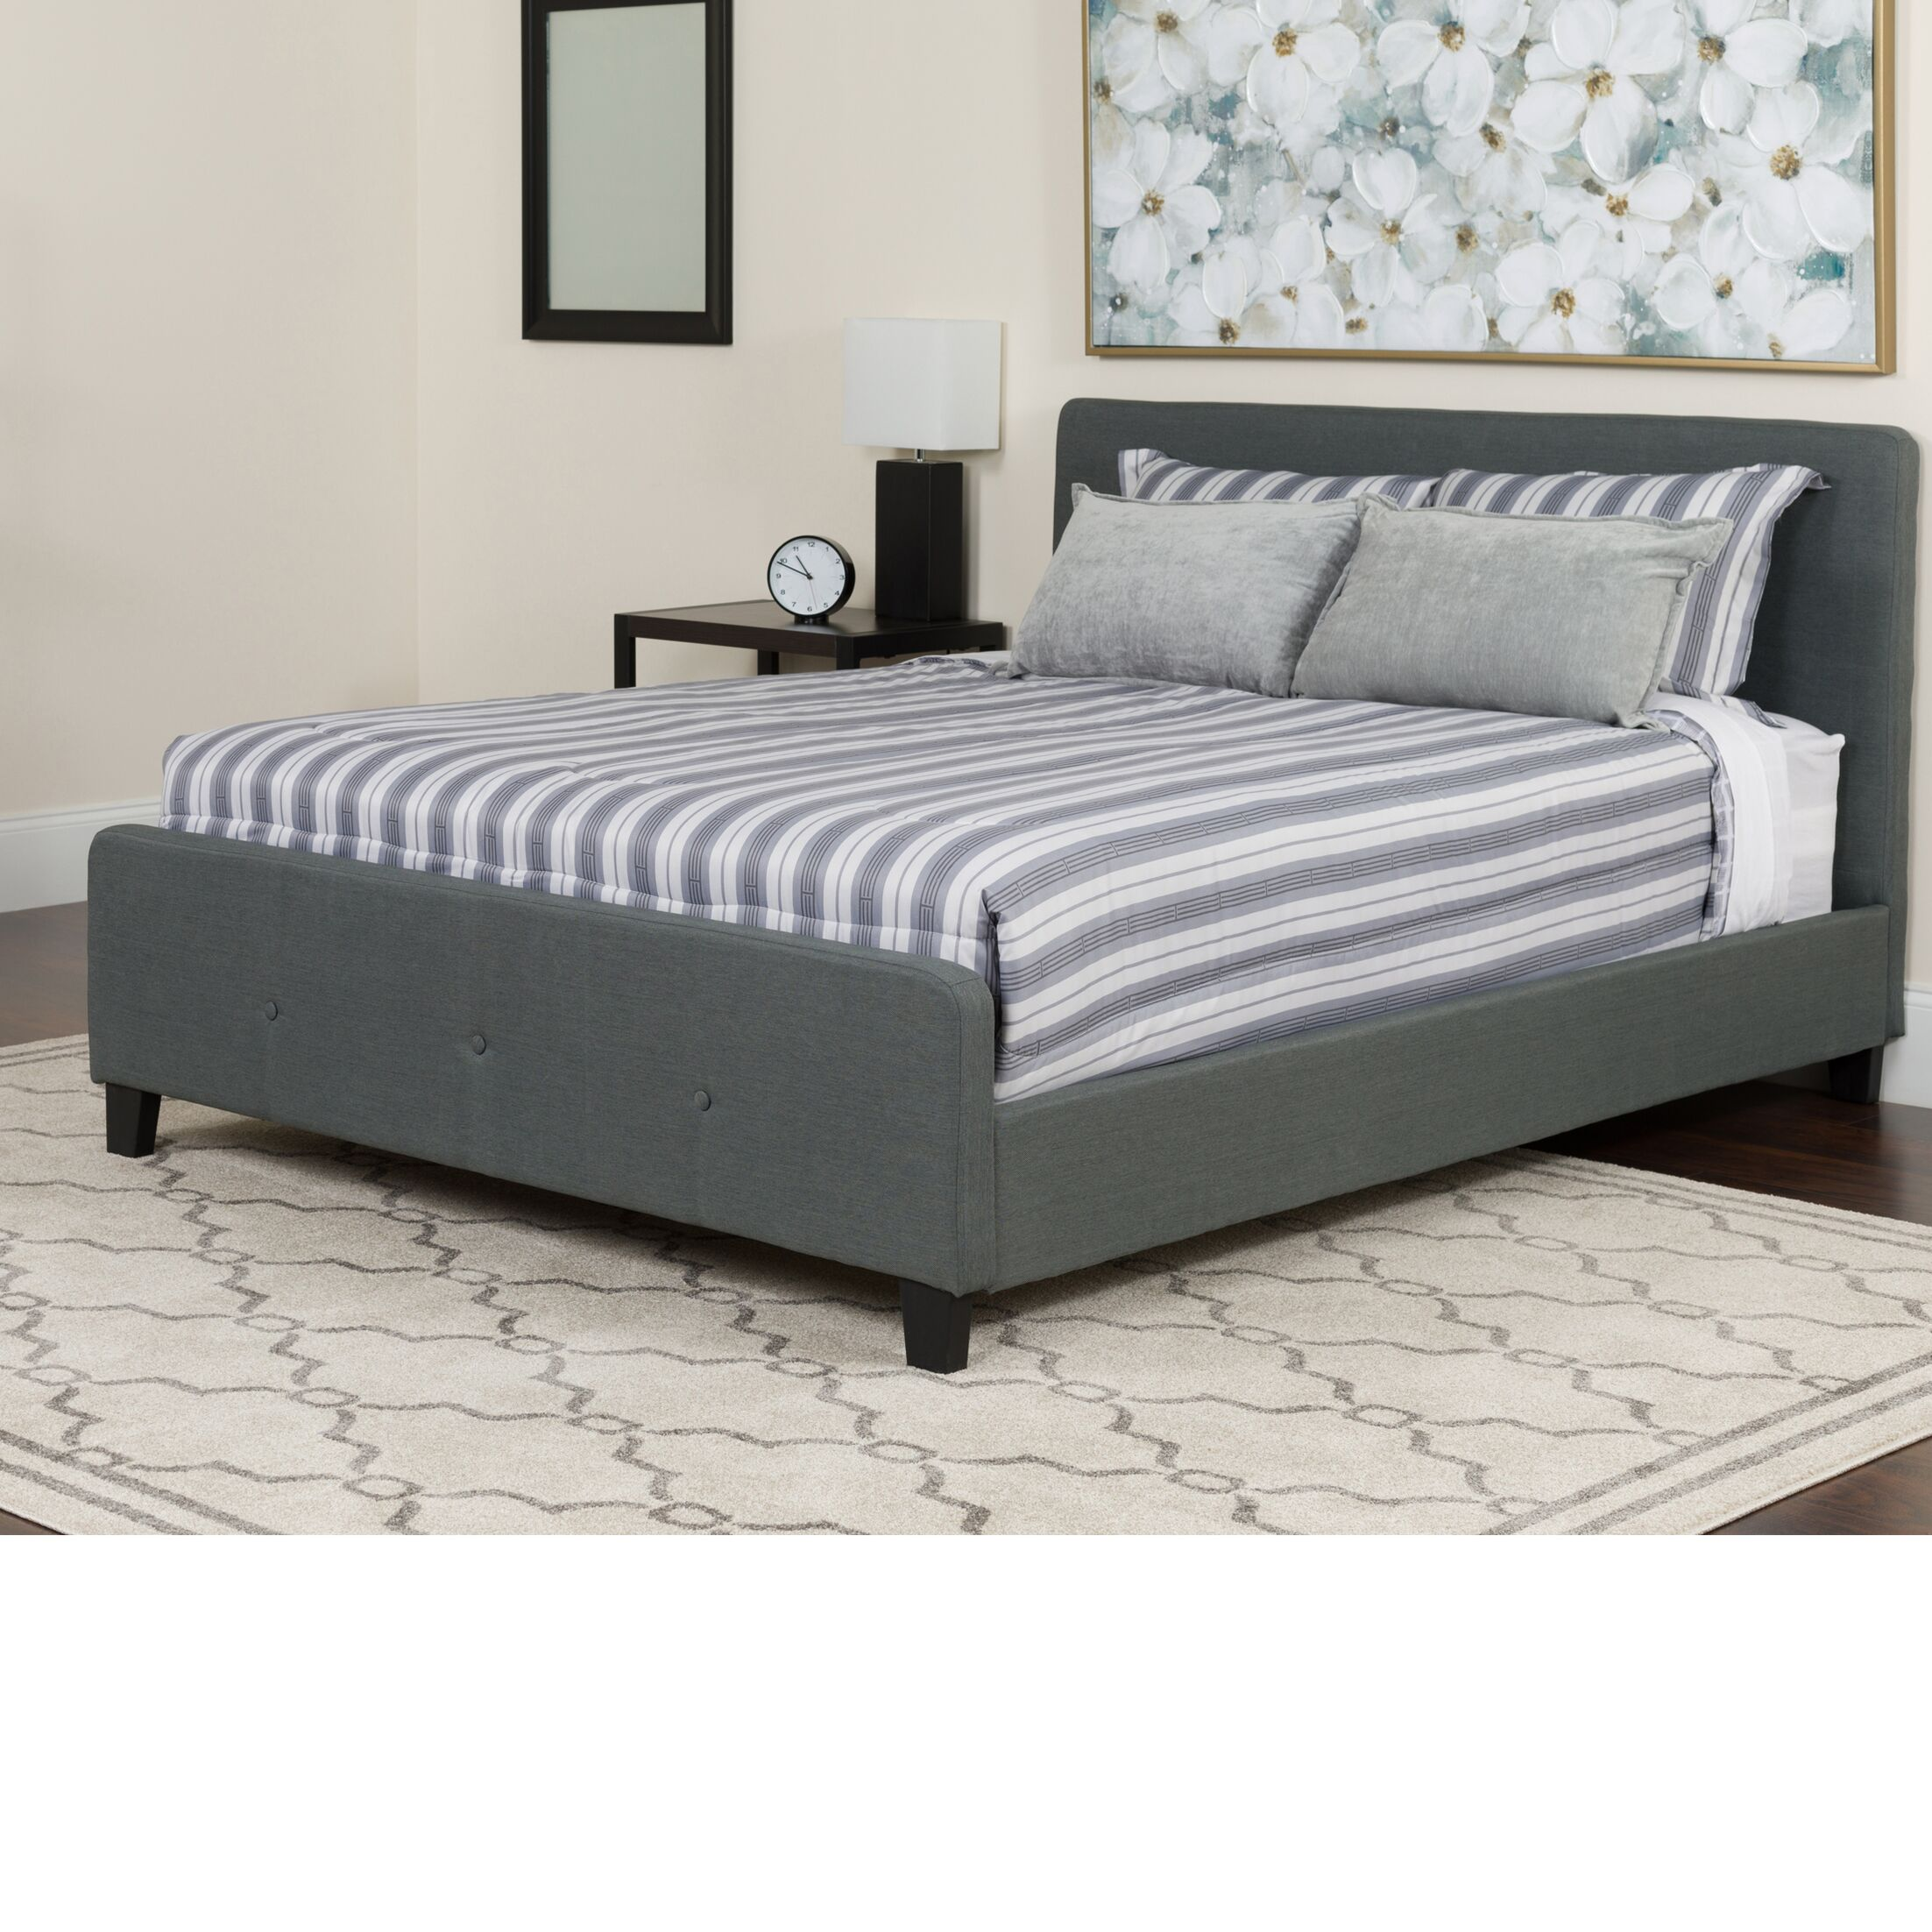 Konen Tufted Upholstered Platform Bed Color: Dark Gray, Size: Queen